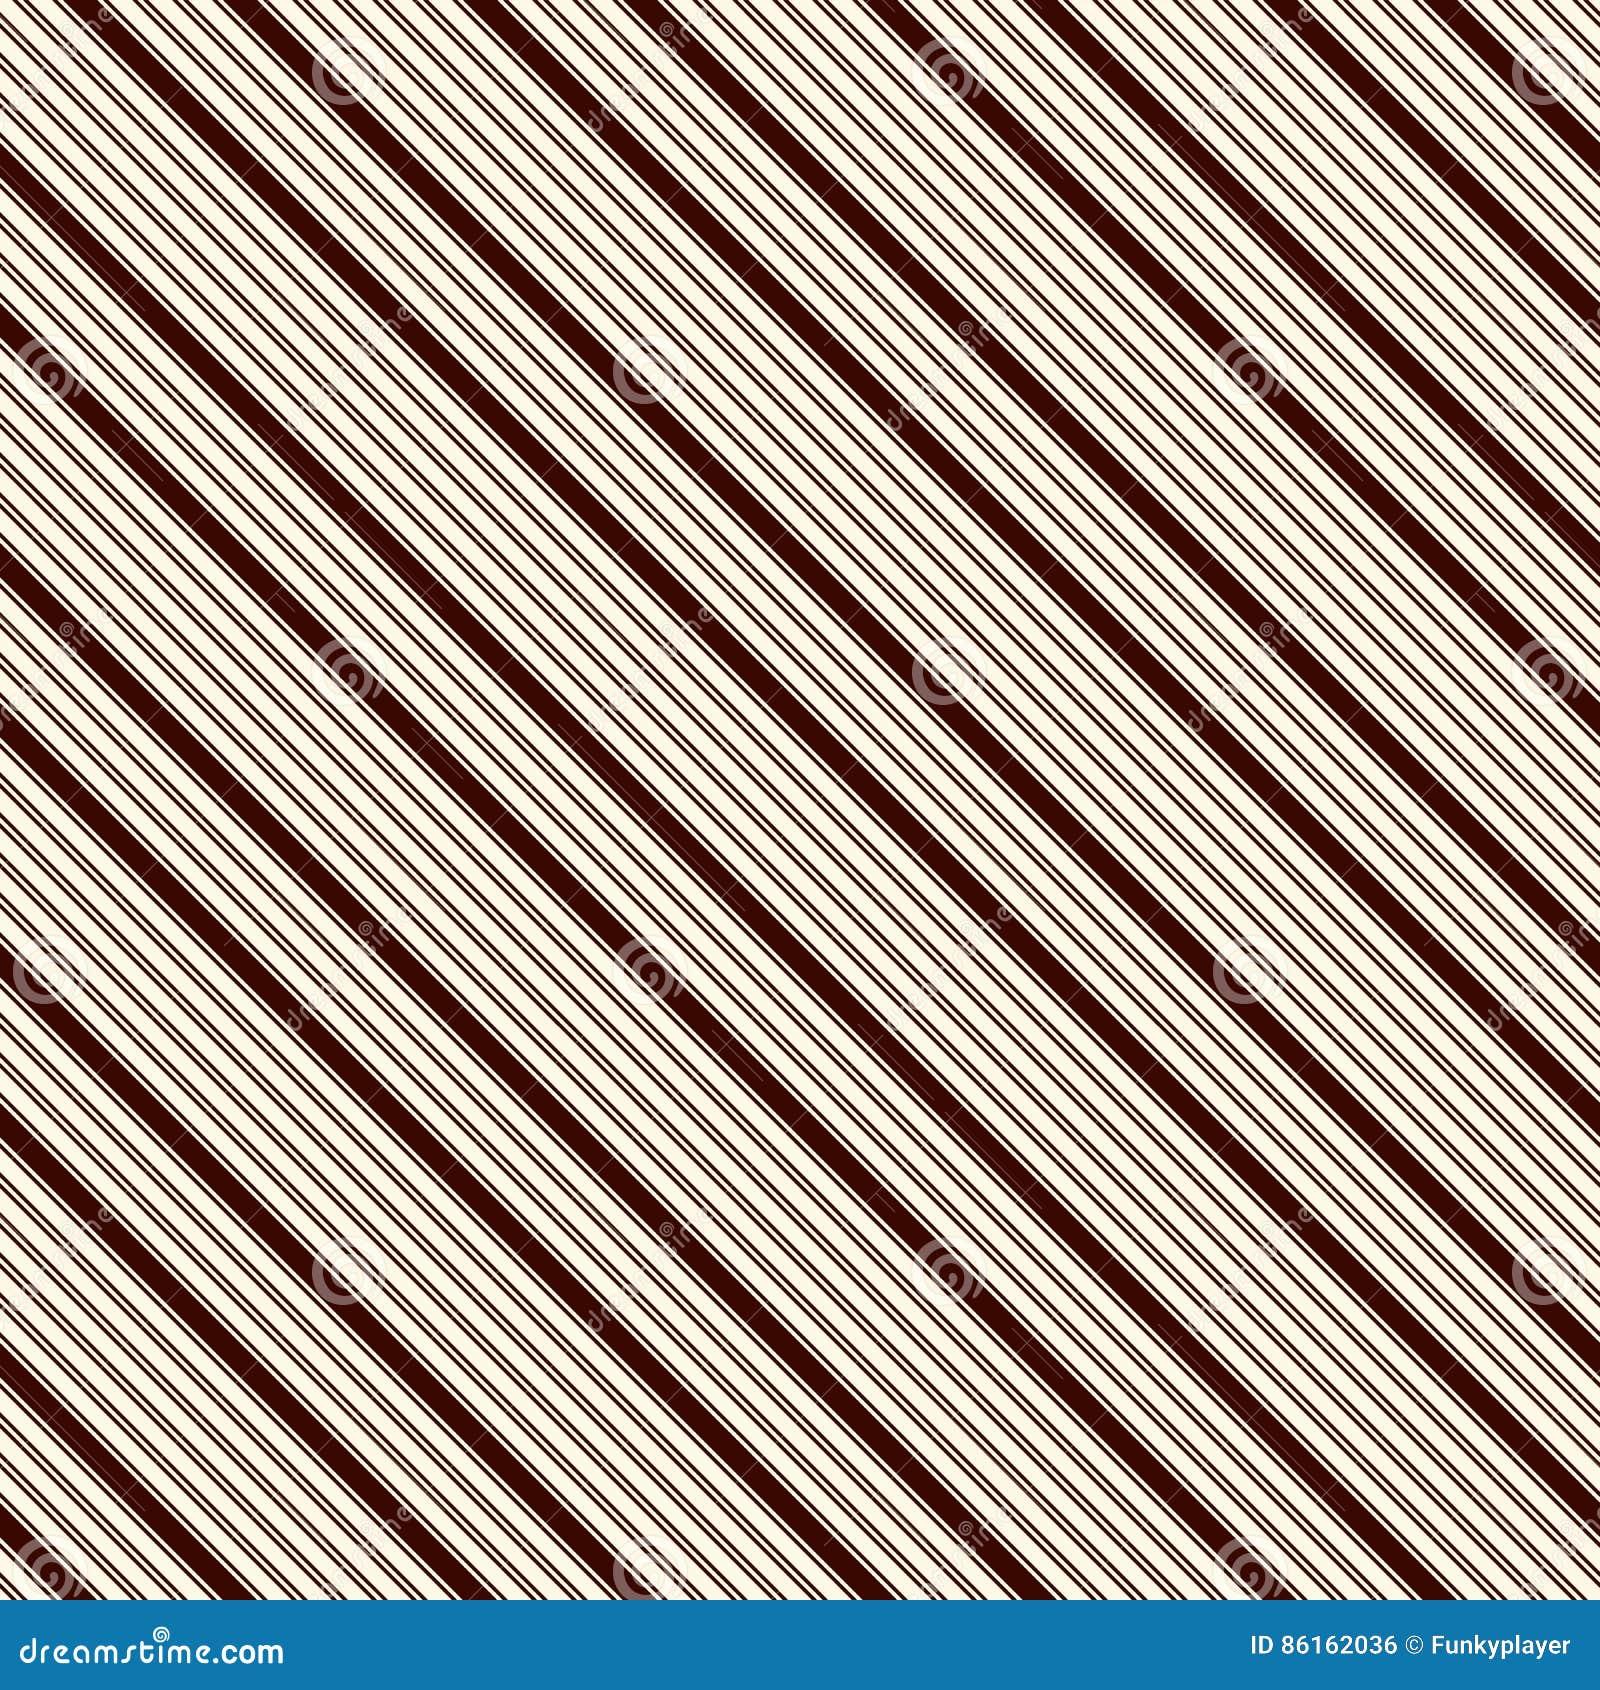 And black diagonal stripes background seamless background or wallpaper - Background Diagonal